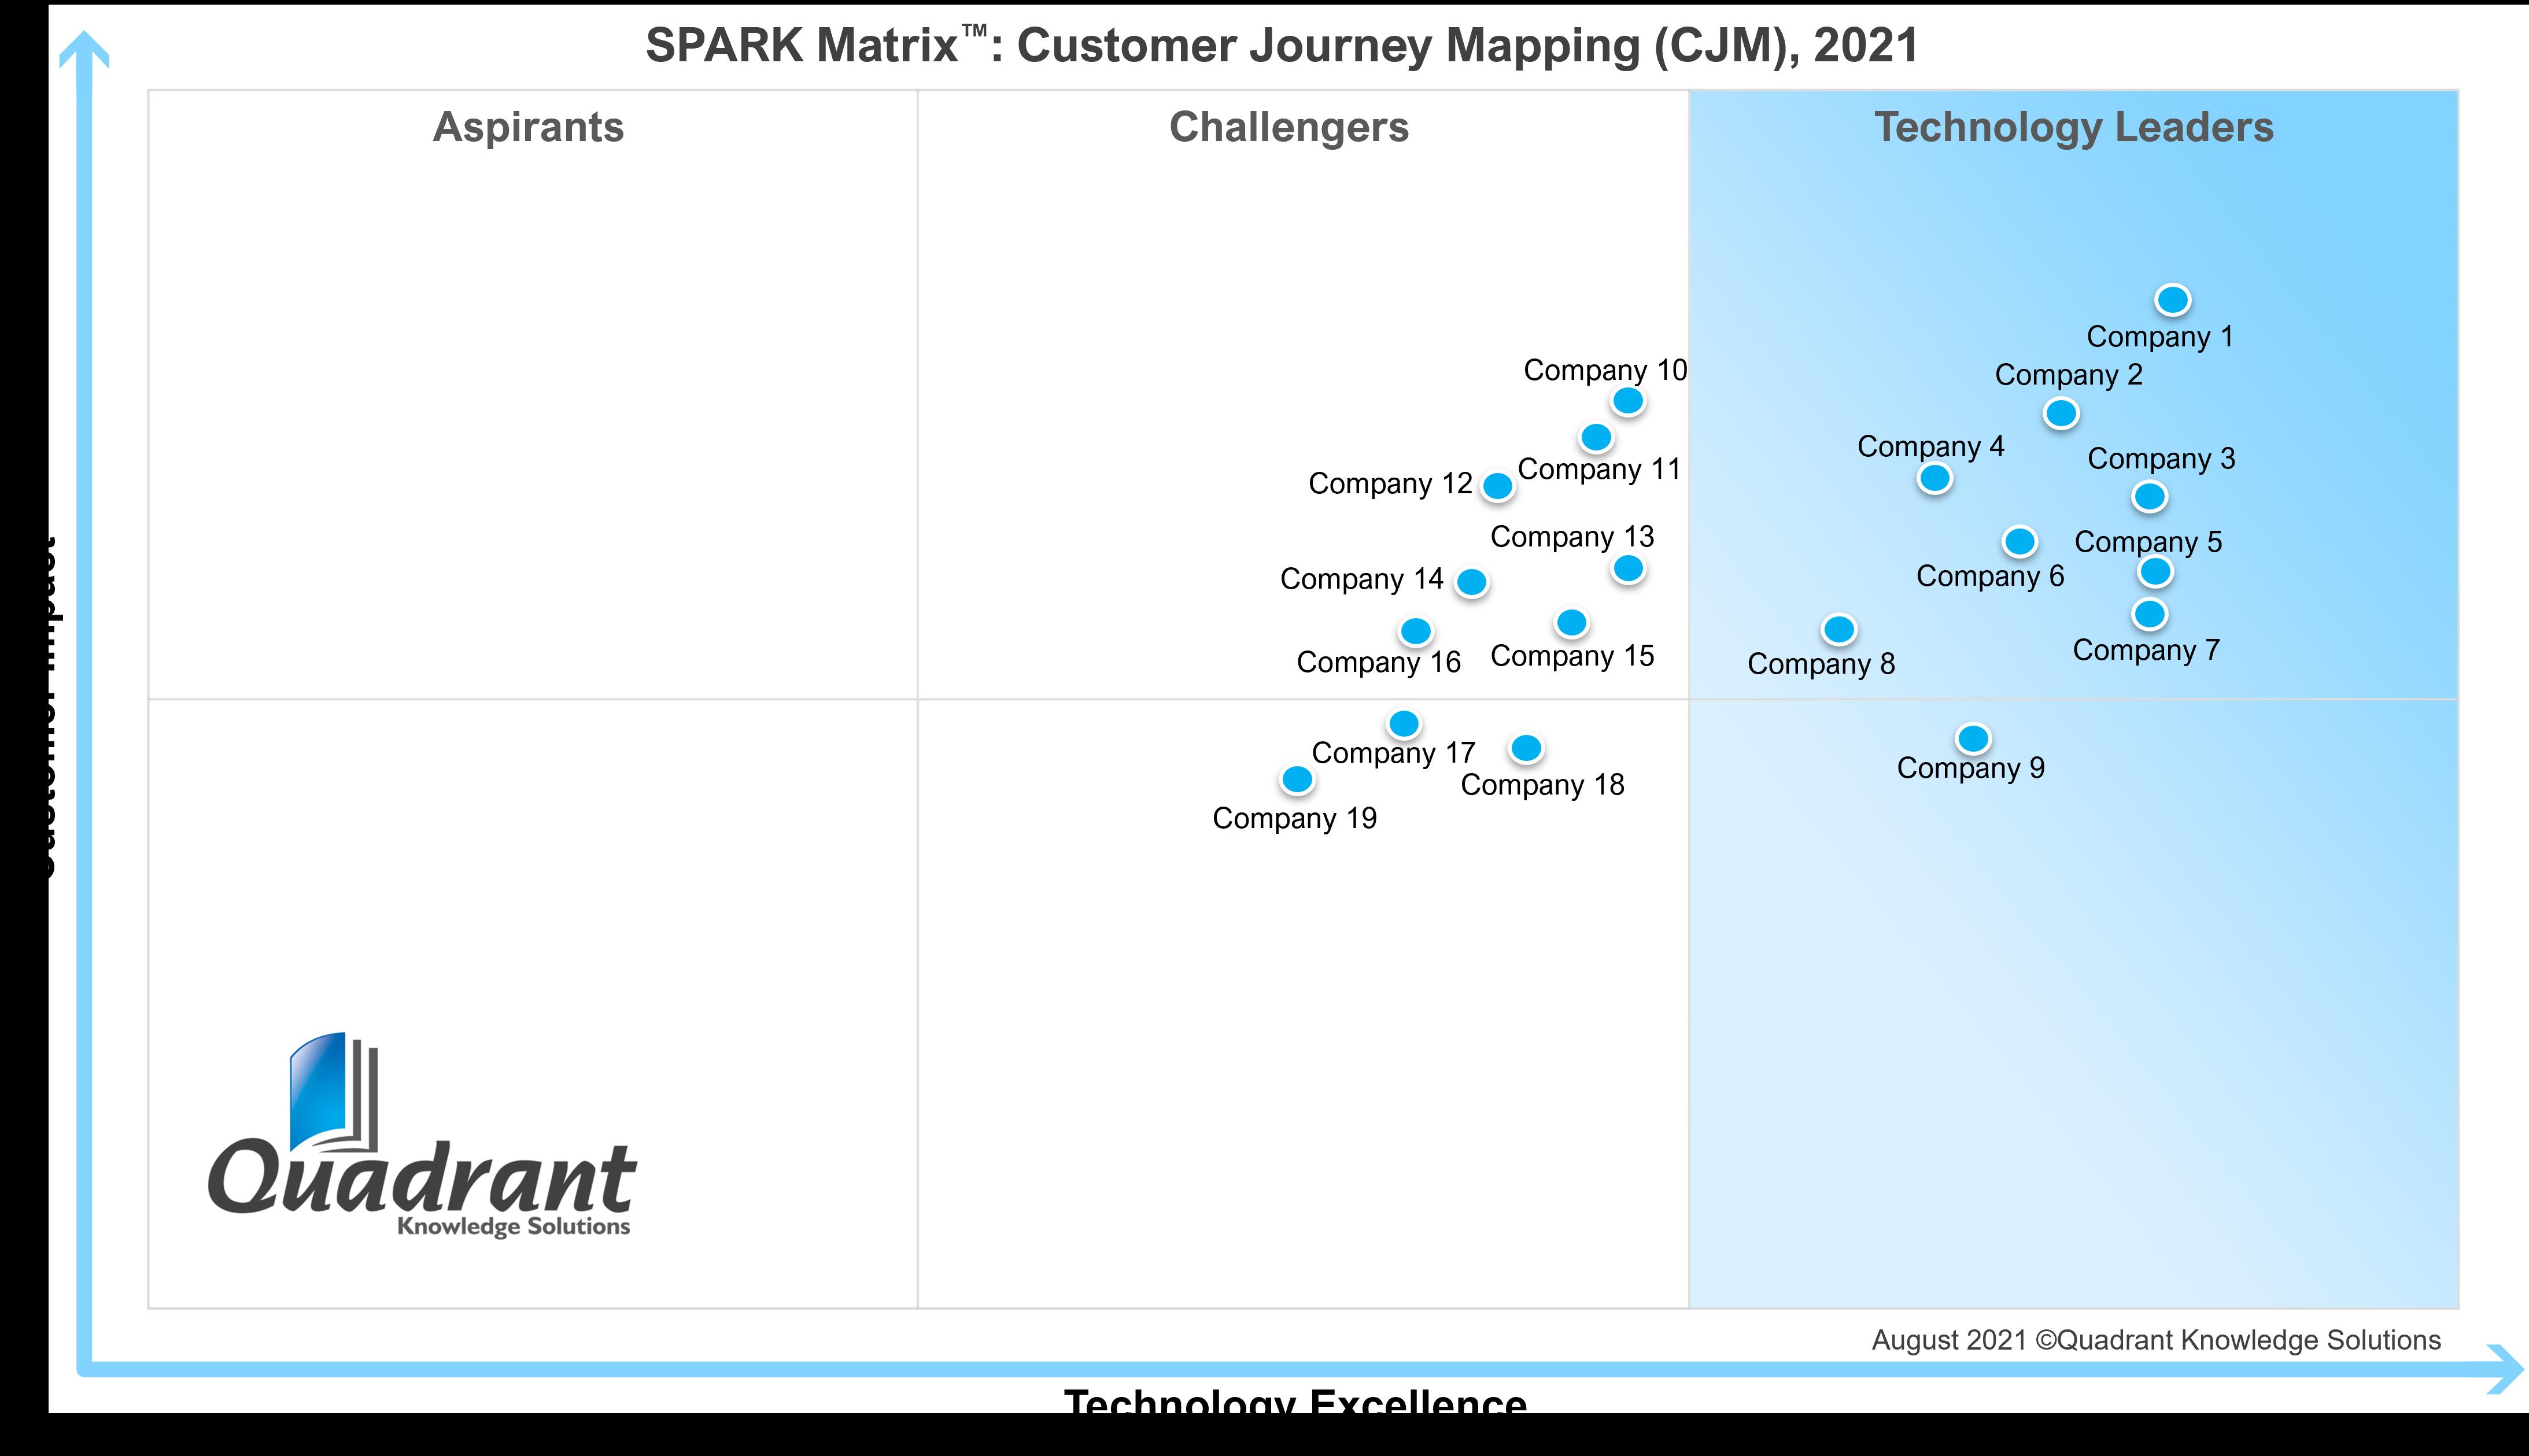 CJM_SPARK Matrix_Image_2021